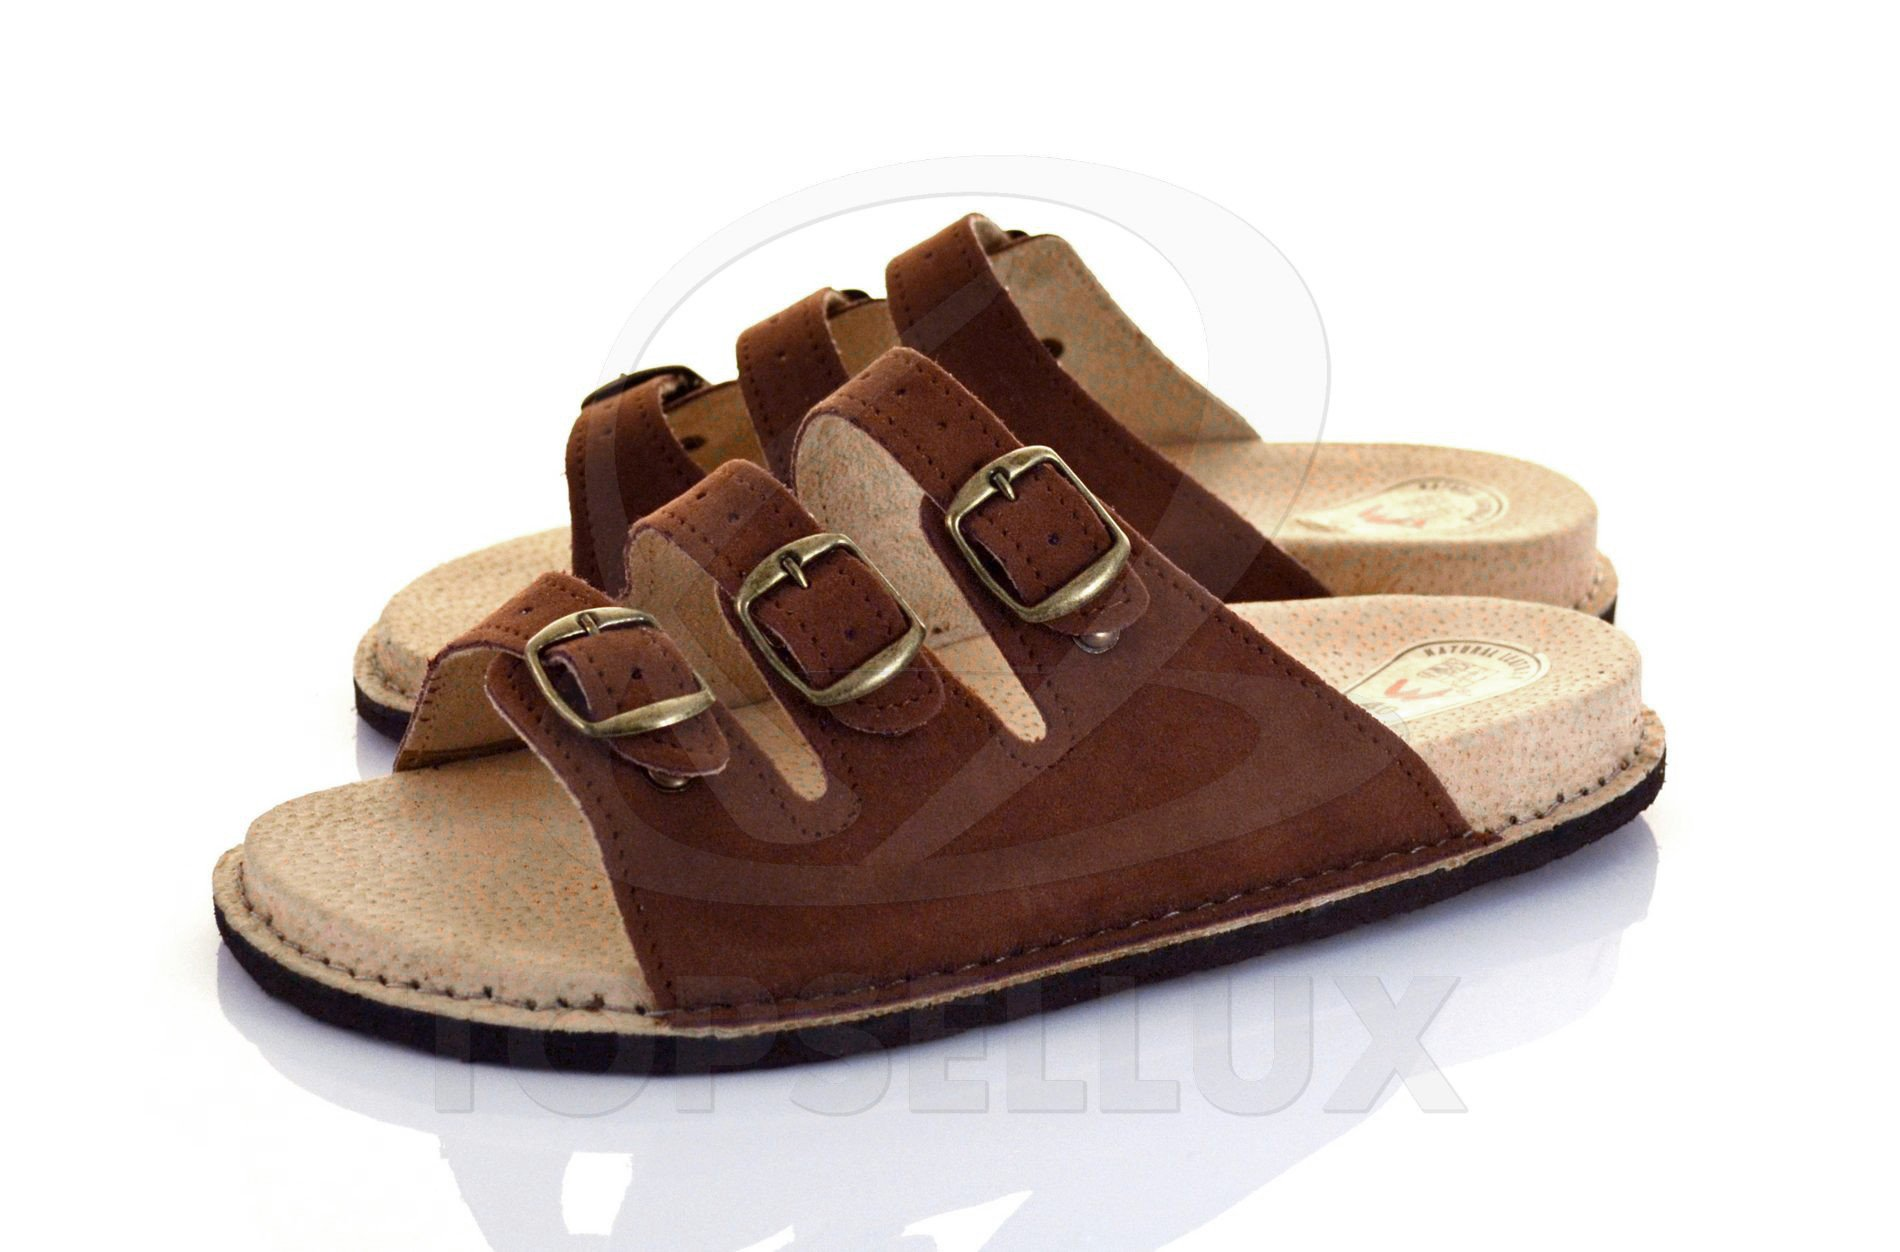 Sandal Med Fotbädd Ortopedisk Sula Arbete Fritid Skor Dam Sandaler Sko Stl 37